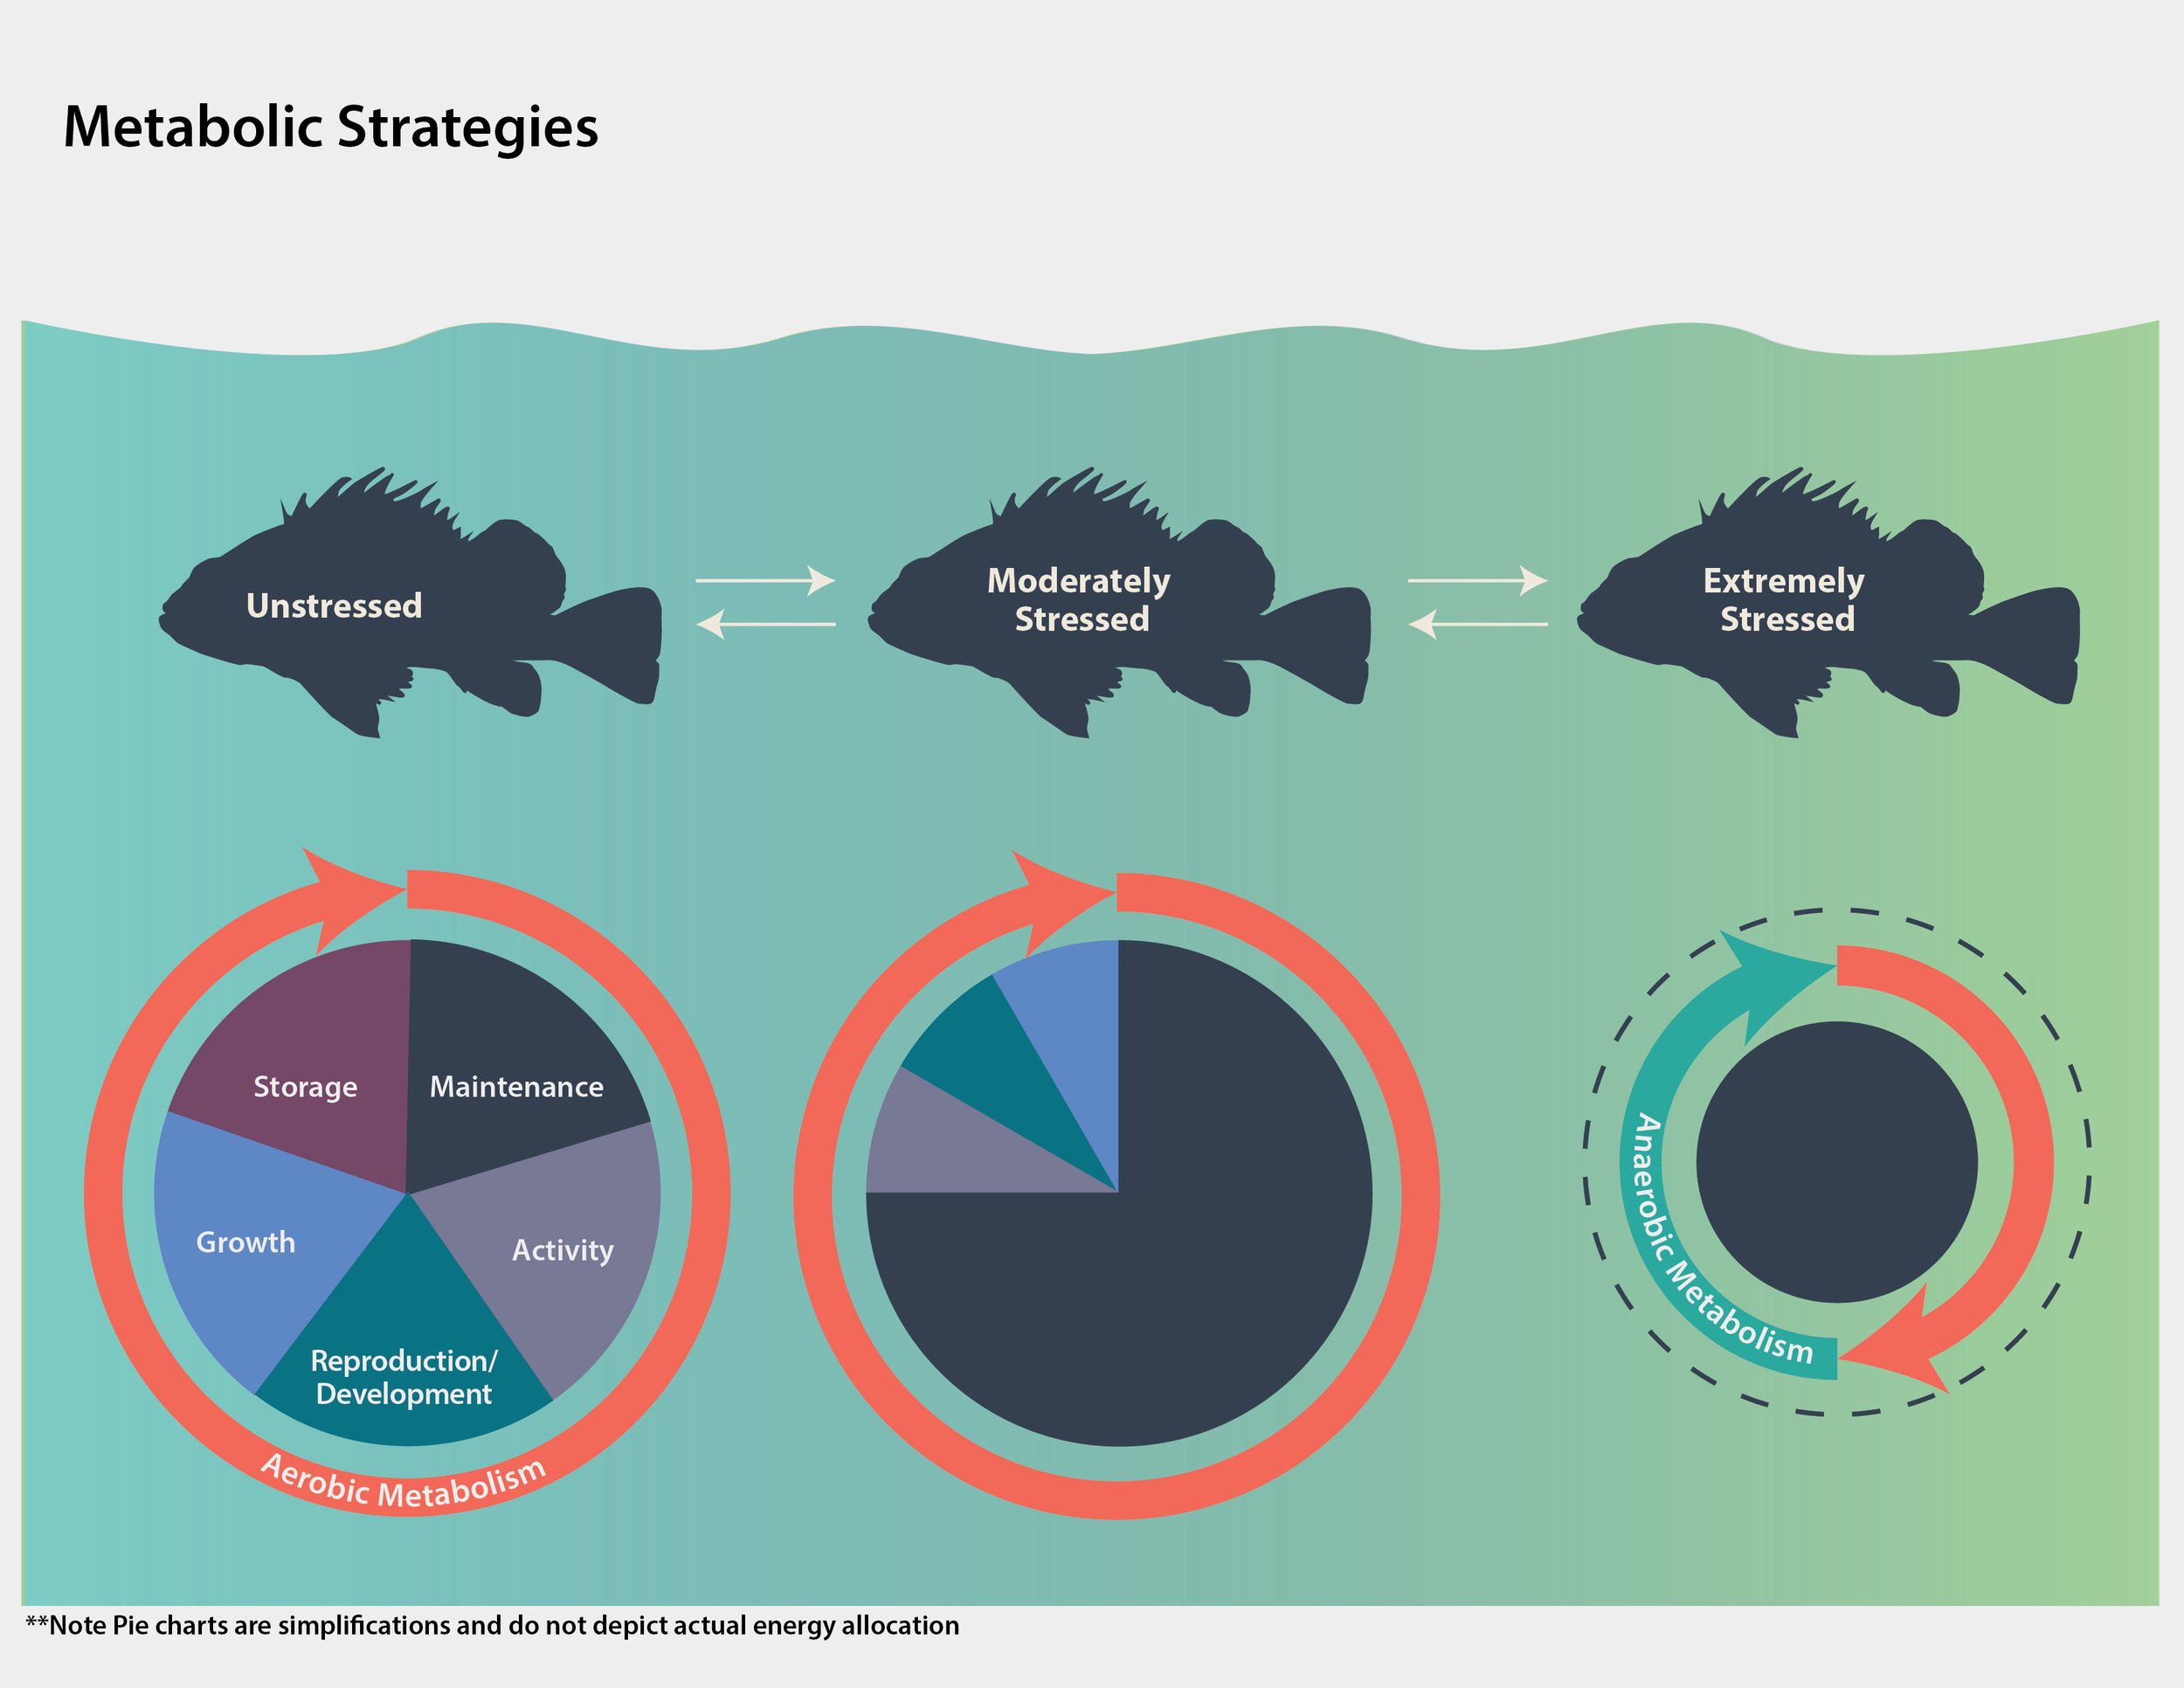 Metabolic Strategies of Brown Rockfish